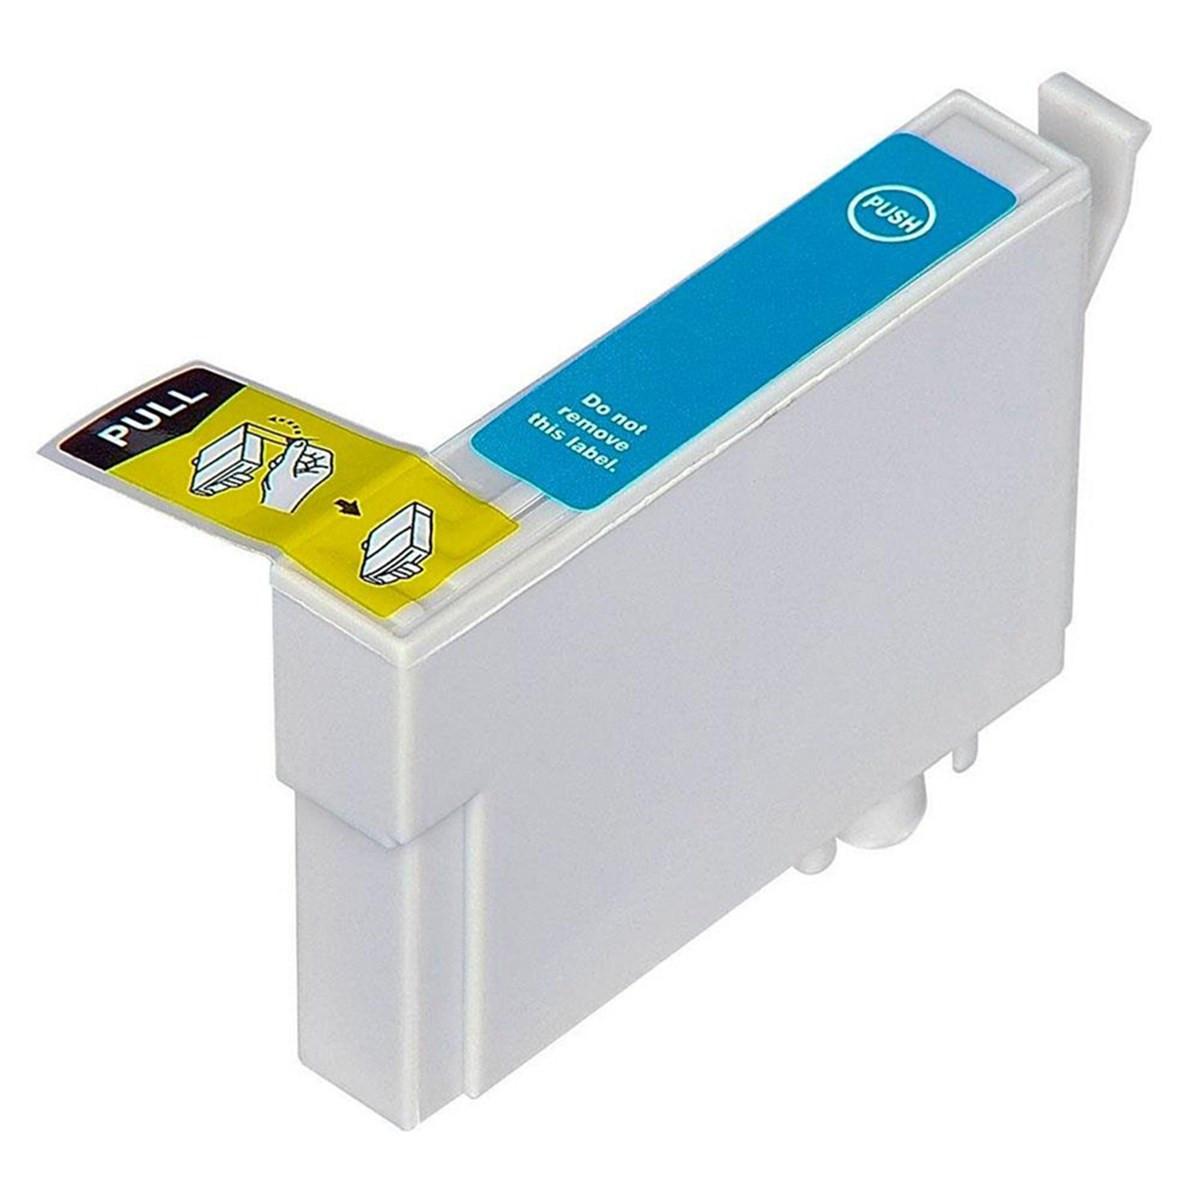 Cartucho de Tinta Compatível com Epson T296220 T296 Ciano | XP-441 XP-431 XP-241 | 13ml